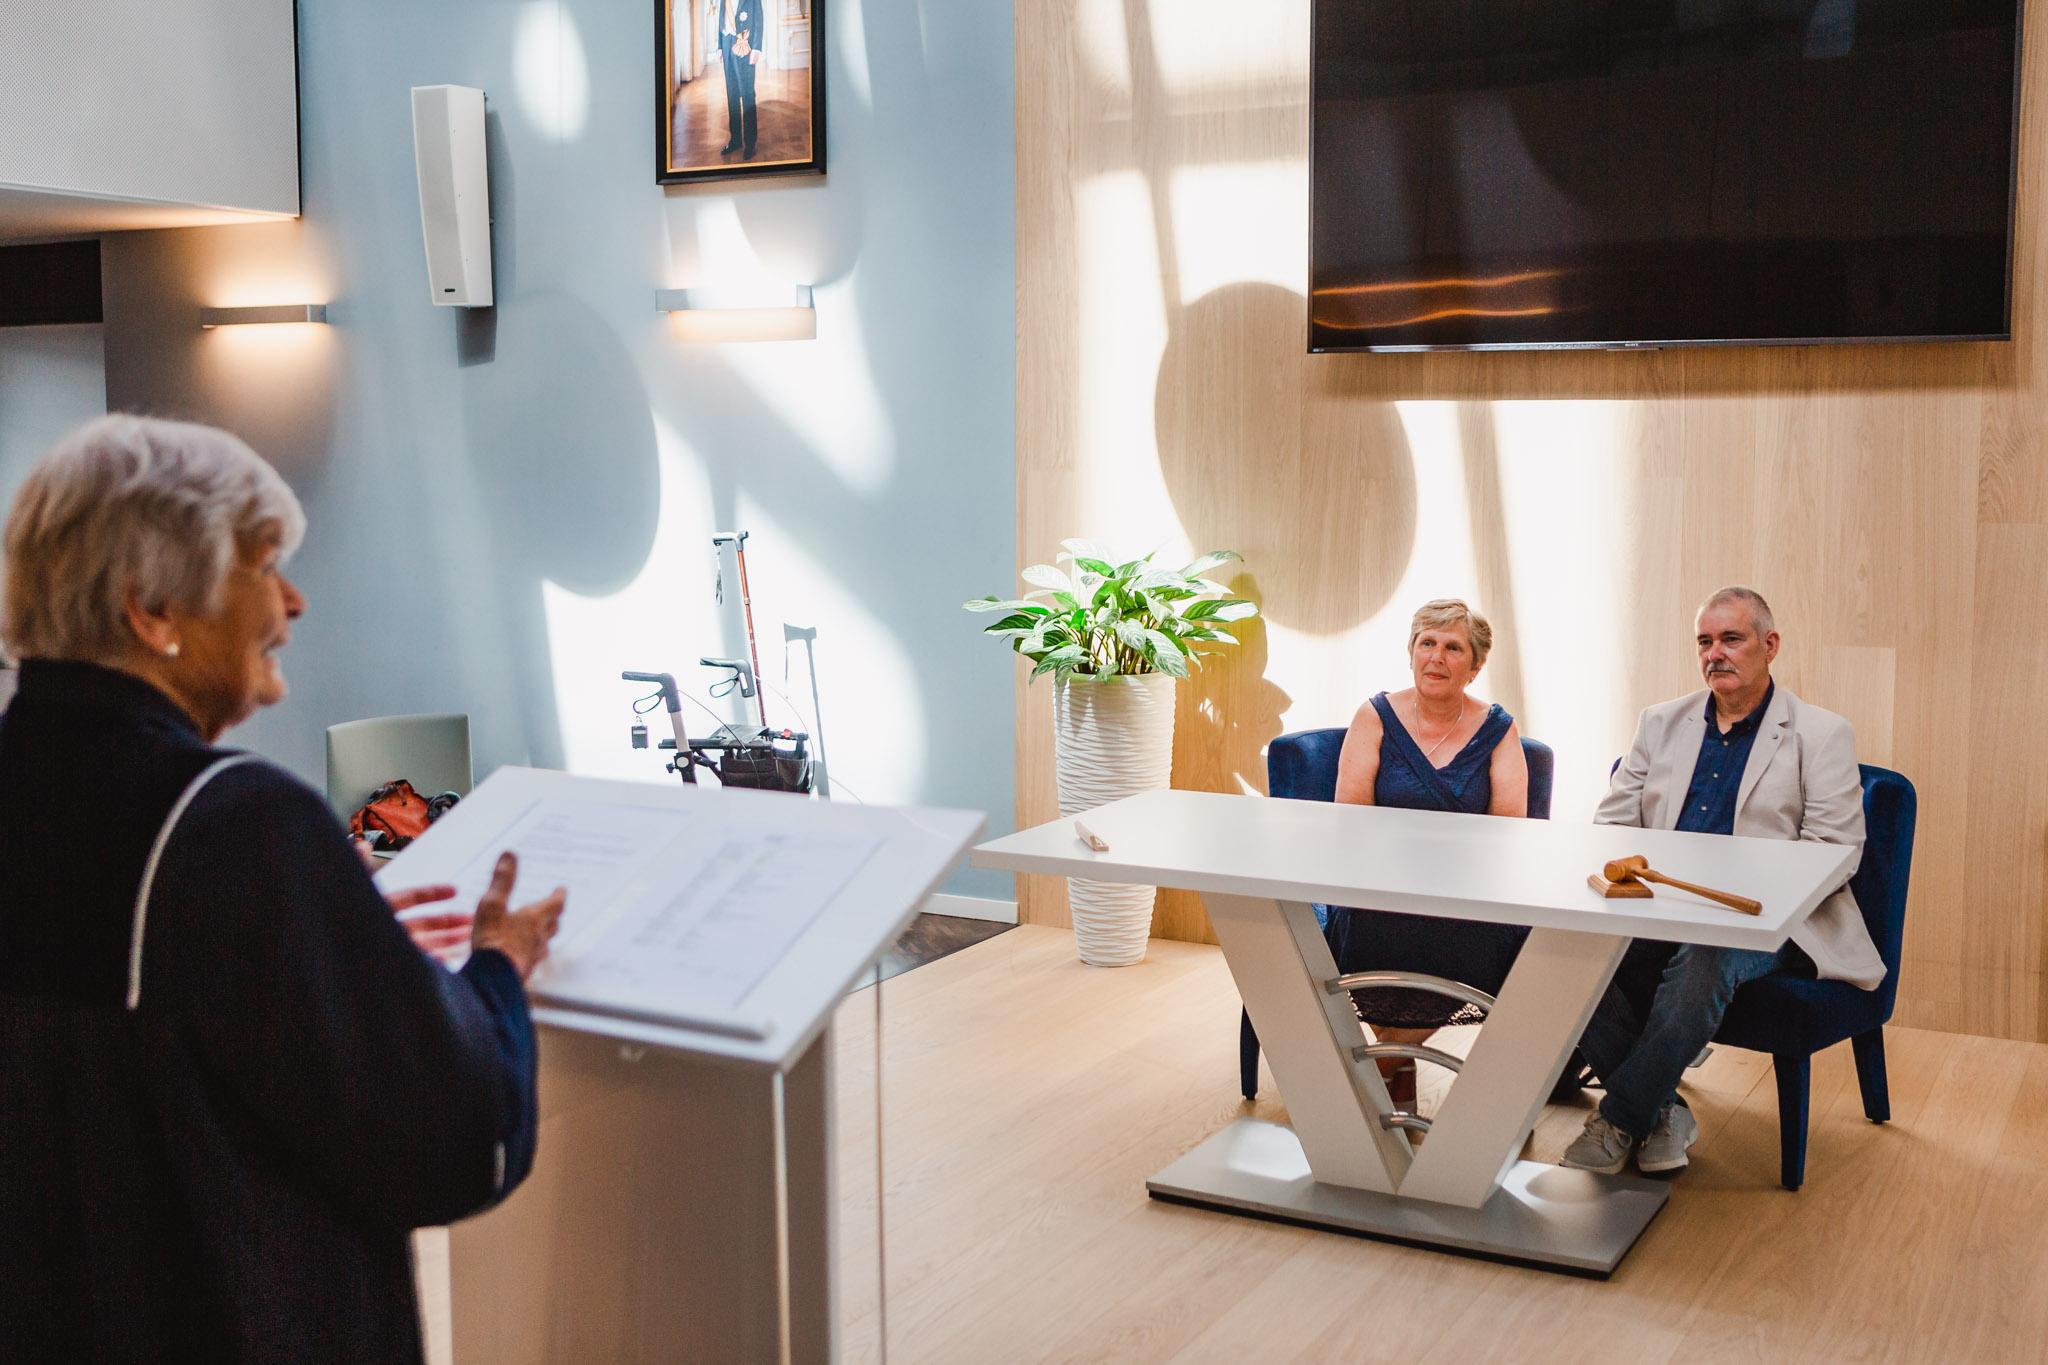 Bruiloft Reportage Geregistreerd Partnerschap Flevoland Lelystad Shot By Sylla 17